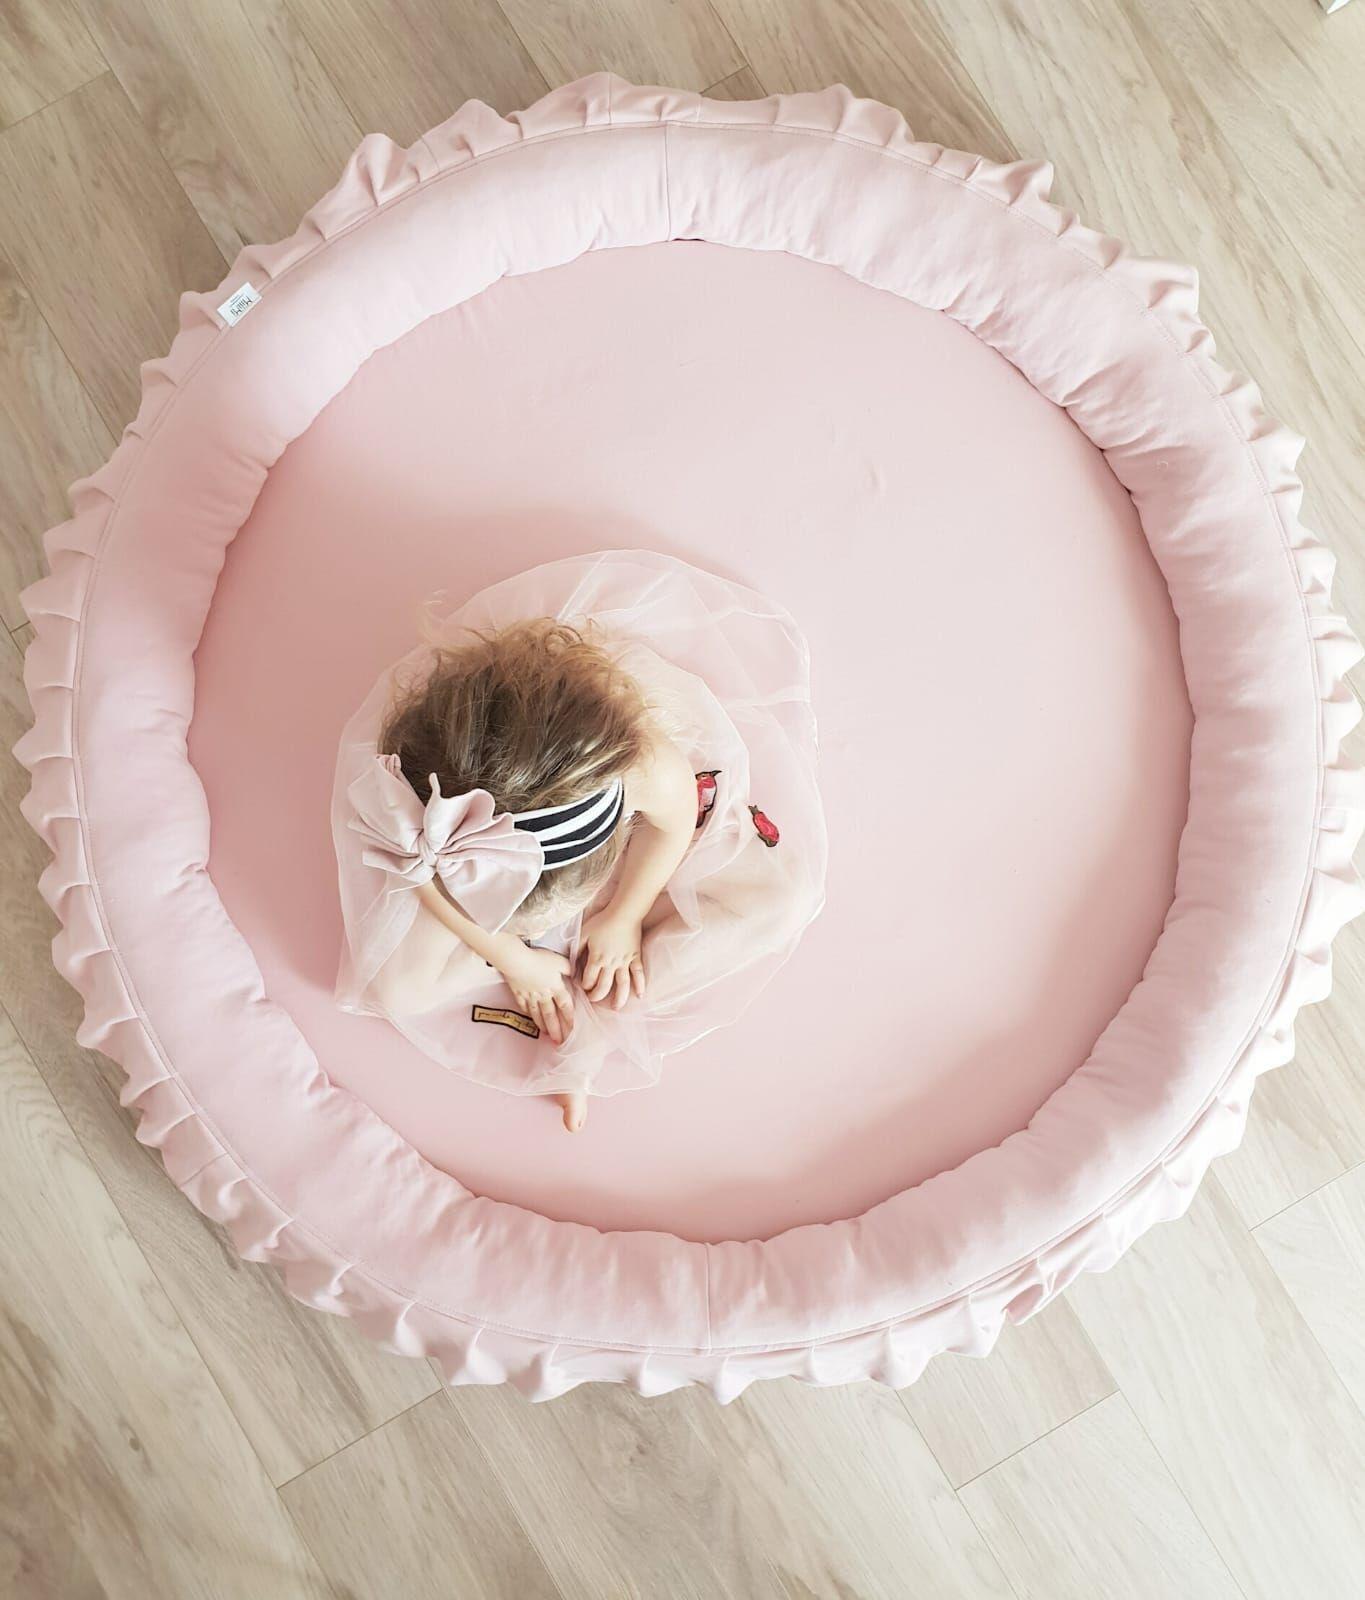 Miiimi Nest Jersey Powder Pink Size 120 cm